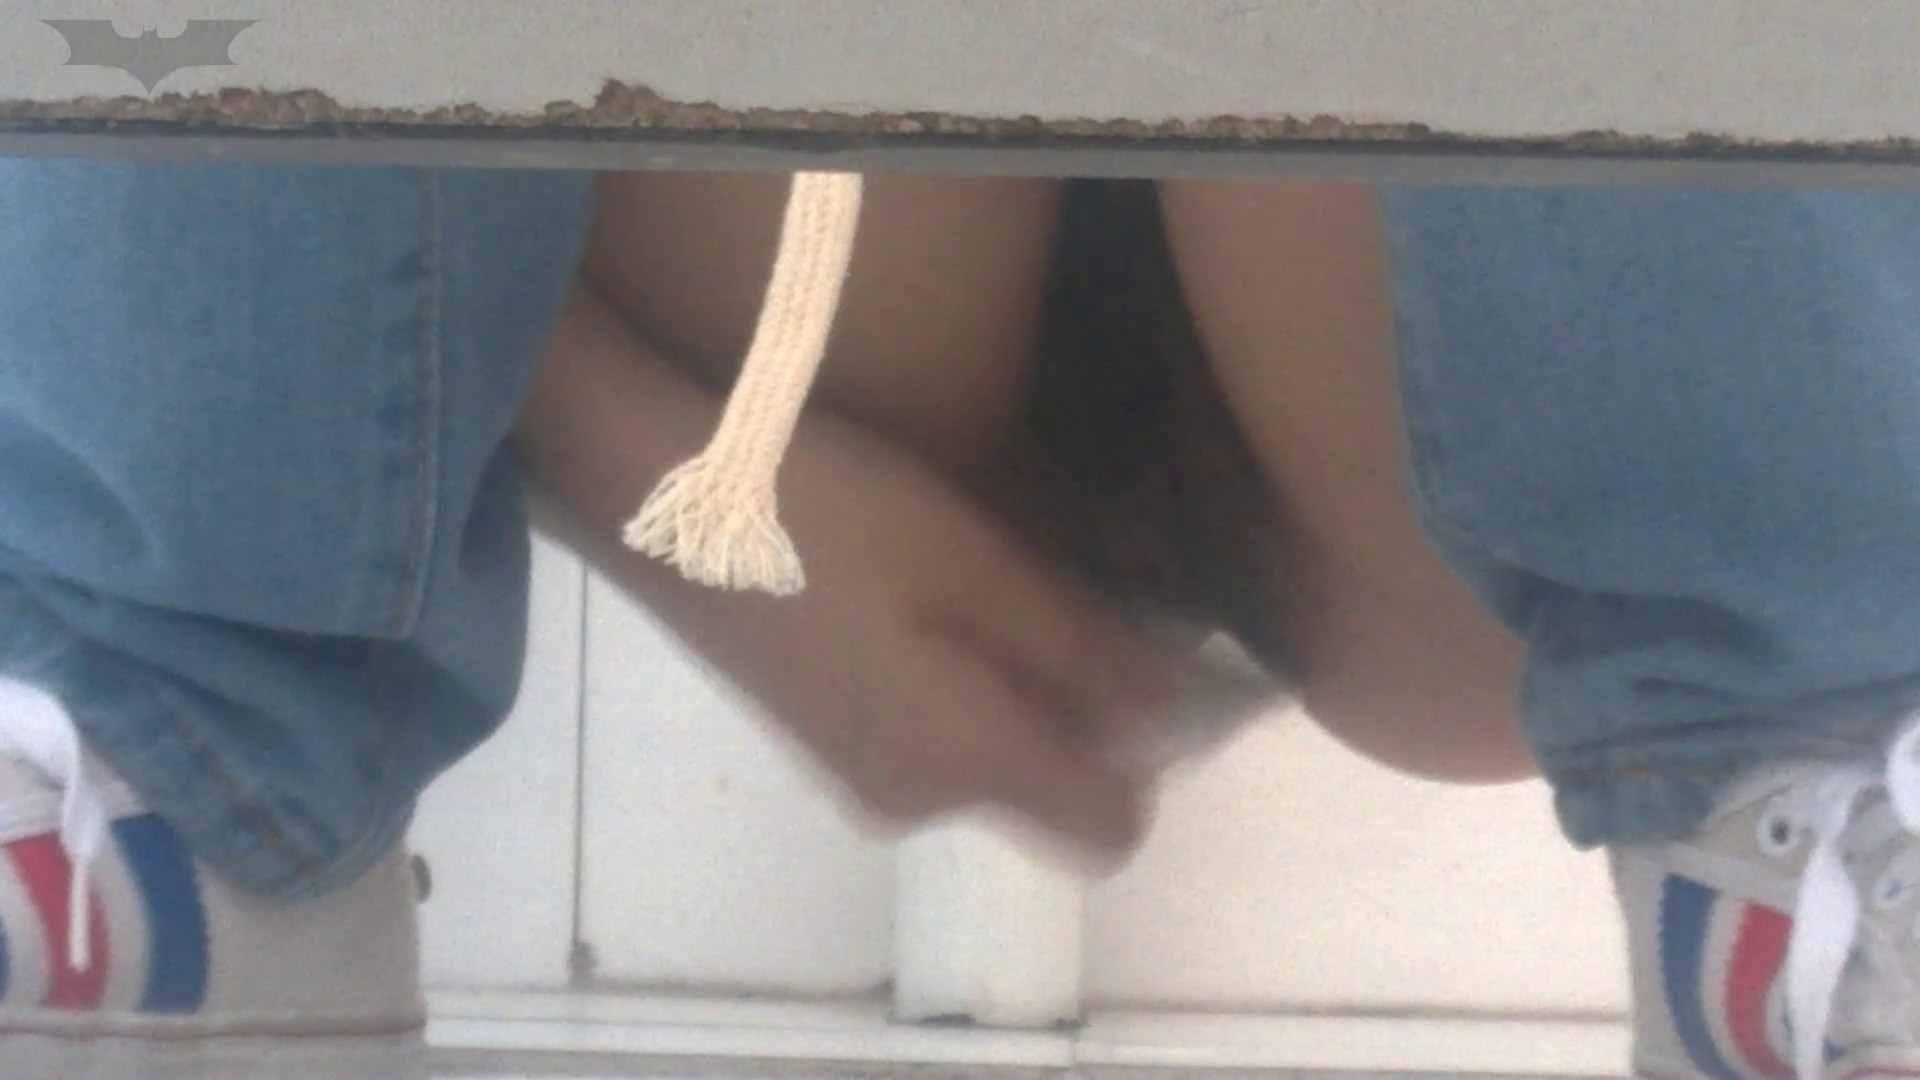 JD盗撮 美女の洗面所の秘密 Vol.05 エッチな盗撮 オメコ動画キャプチャ 107pic 24